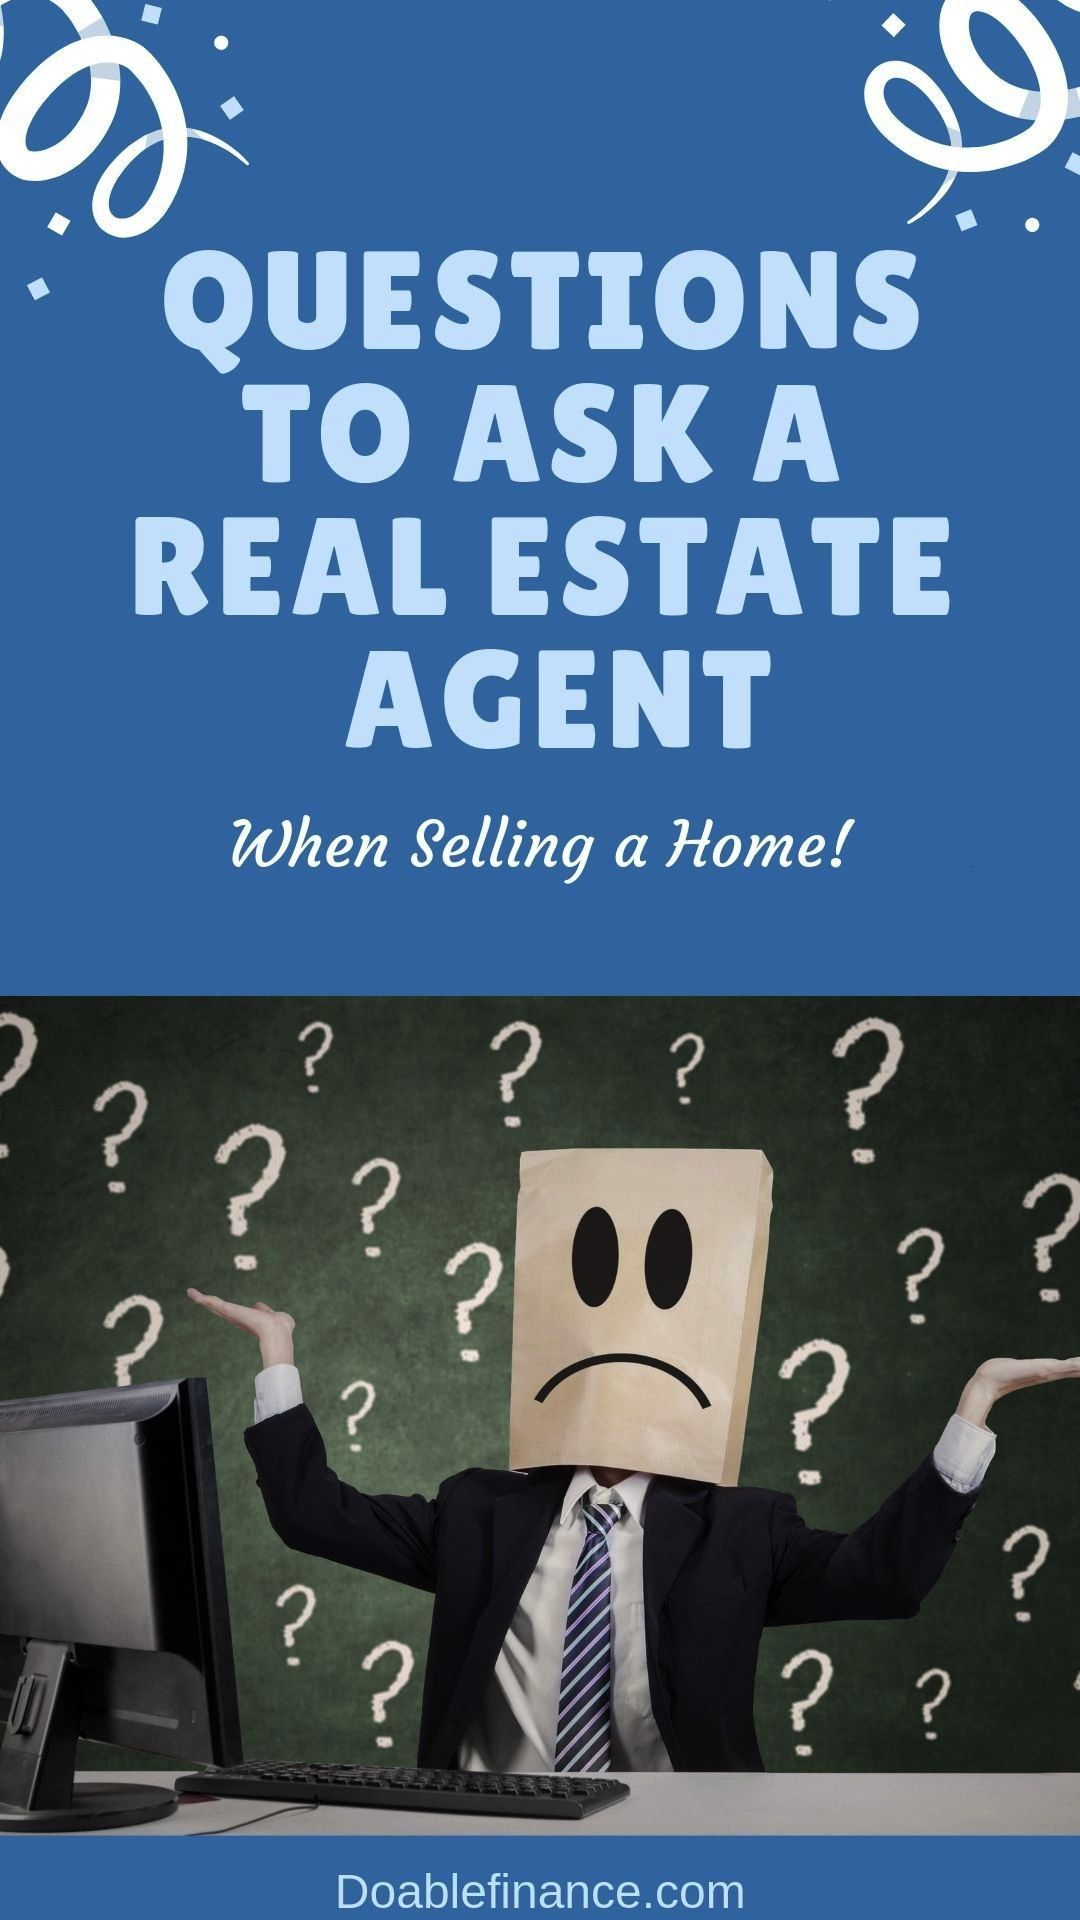 0b8d2f1c7e231cbf42db9e8b95205a5b - How To Get A Real Estate License In Ireland